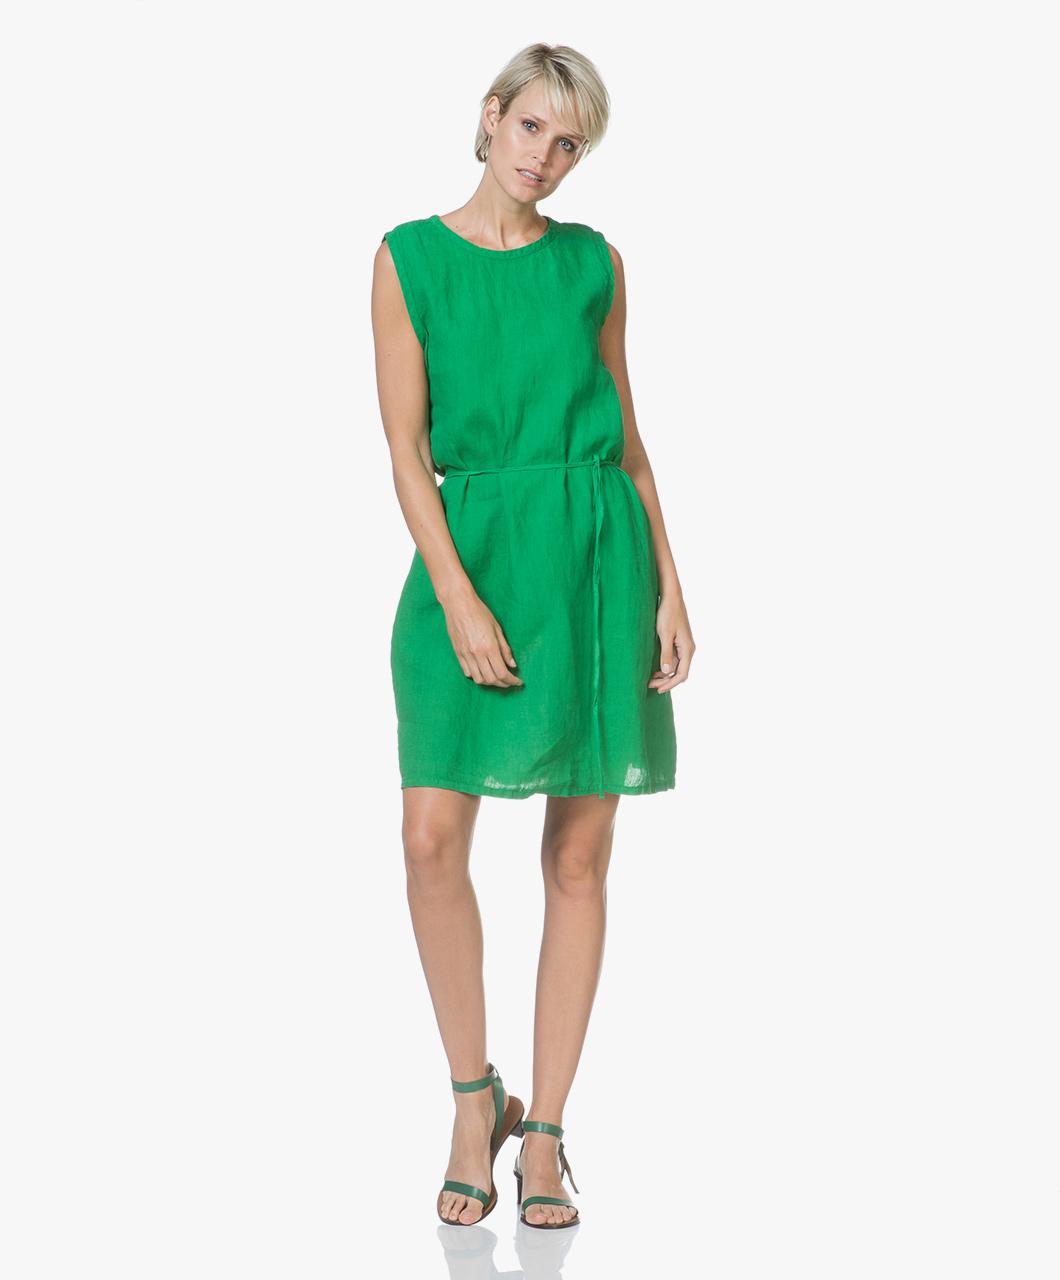 Immagine di American Vintage Dress Pasture Ficobay Sleeveless Linen